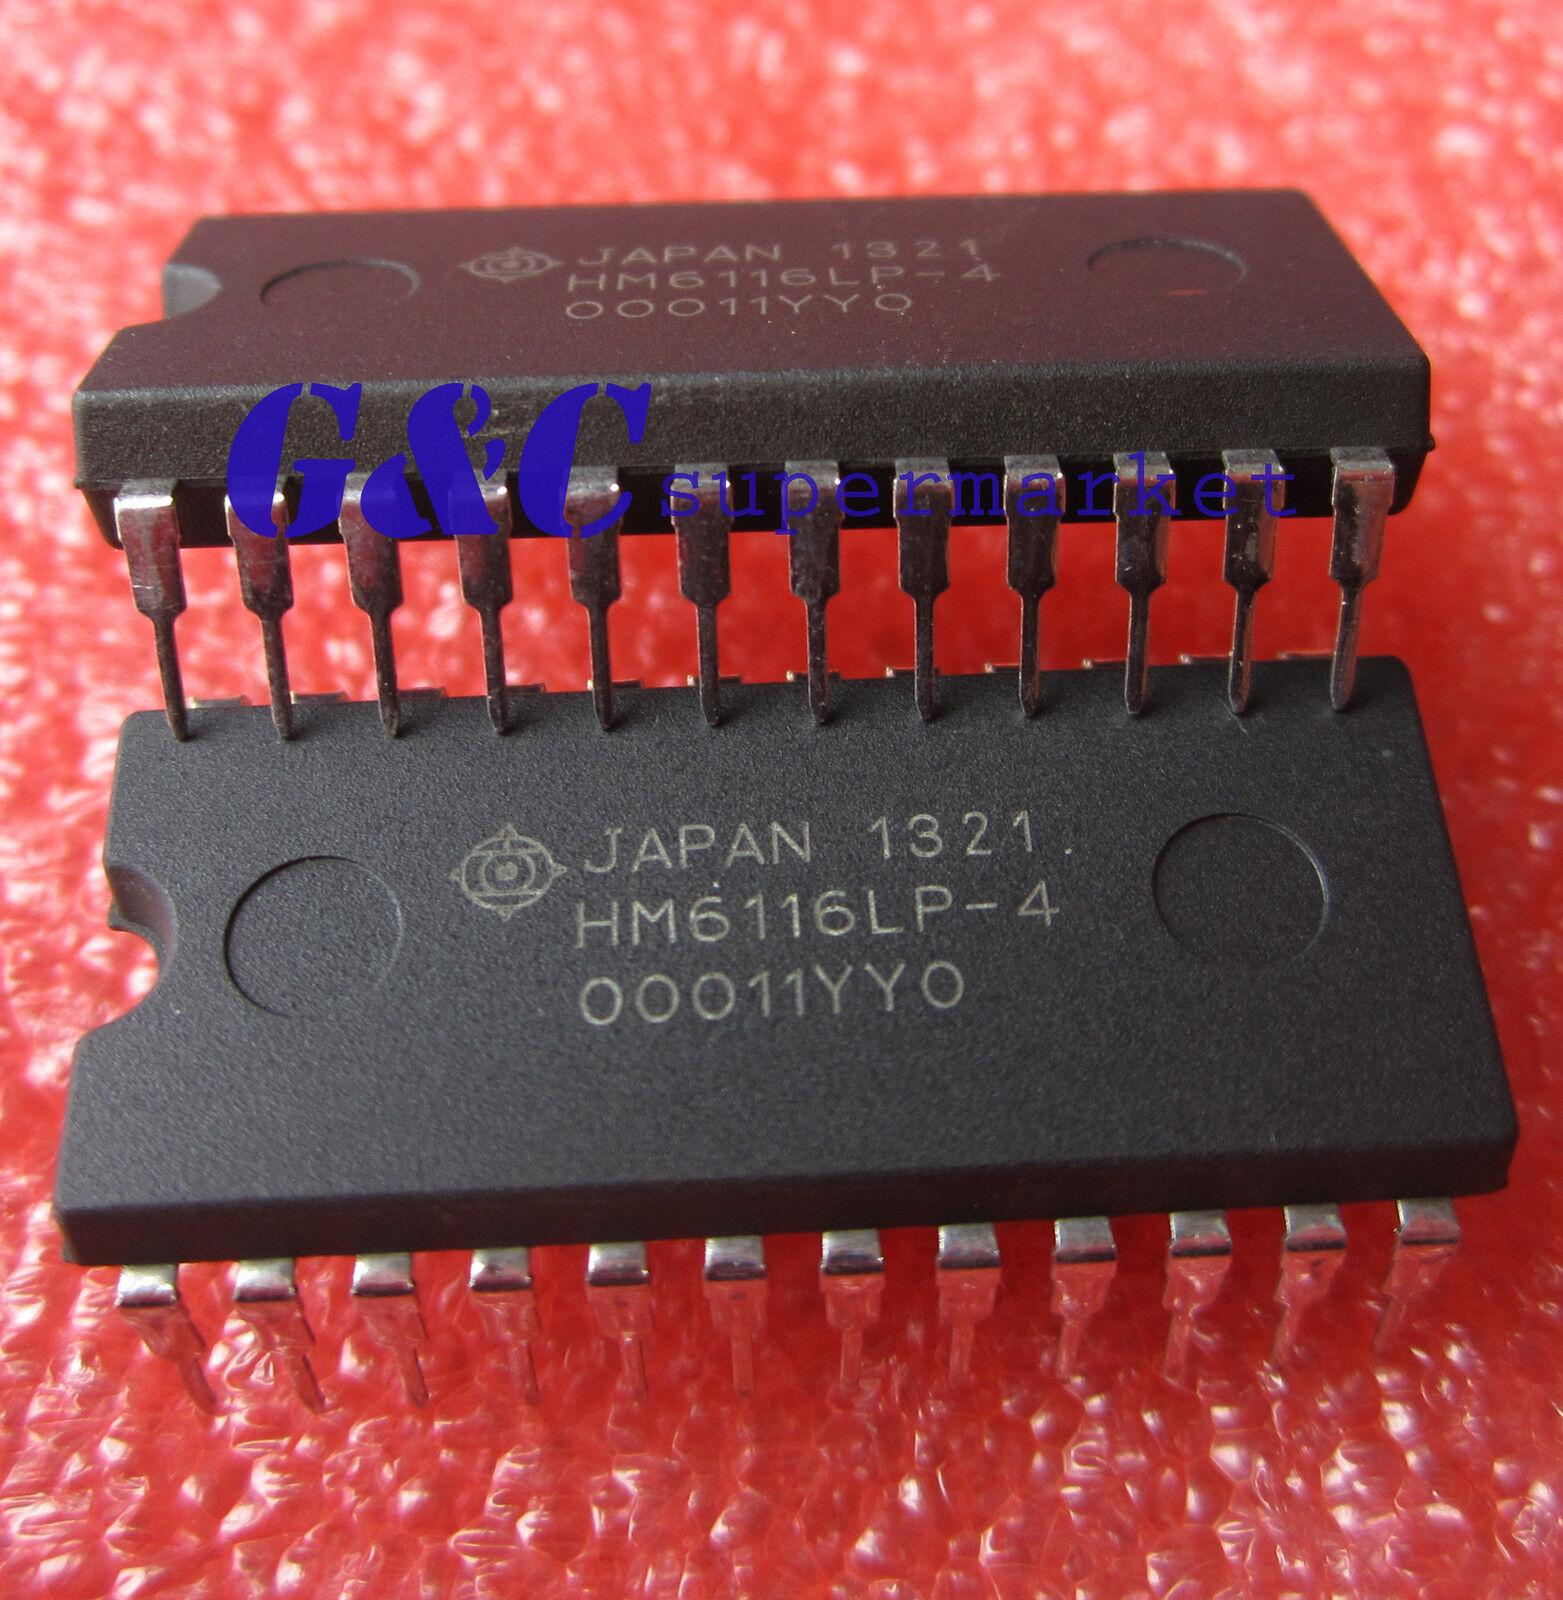 Normal Miro RO26-16A Screw Fuse 380V 16 Amp D01 gG